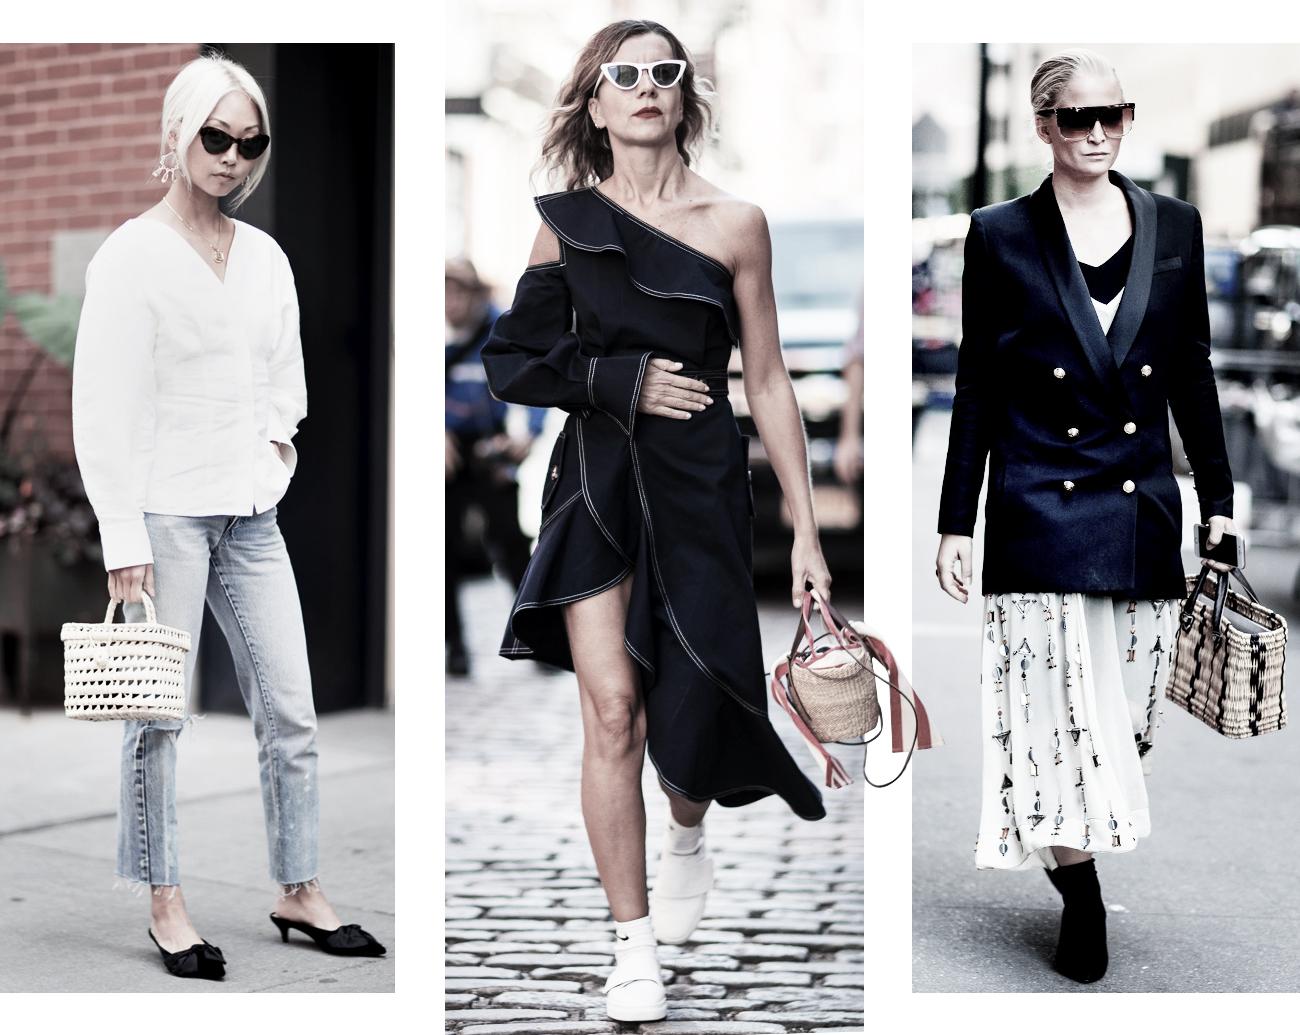 DISTRICT F - NEW YORK STREET STYLE SS18 wicker bag trend